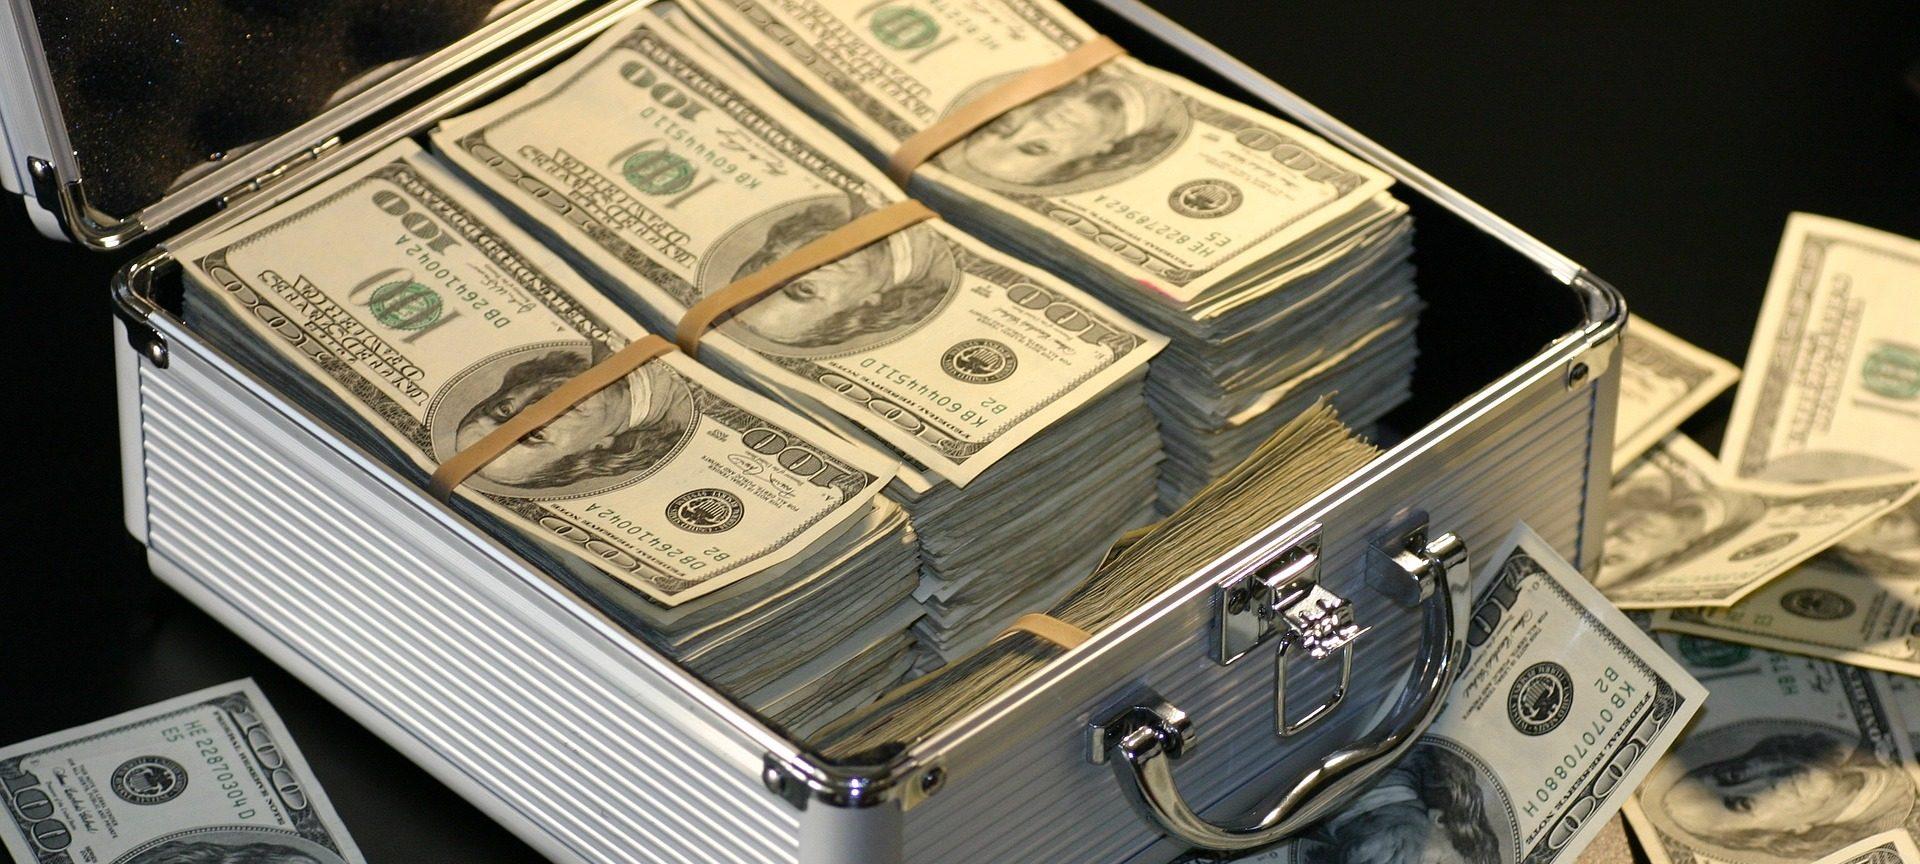 money-laundering-whistleblowers